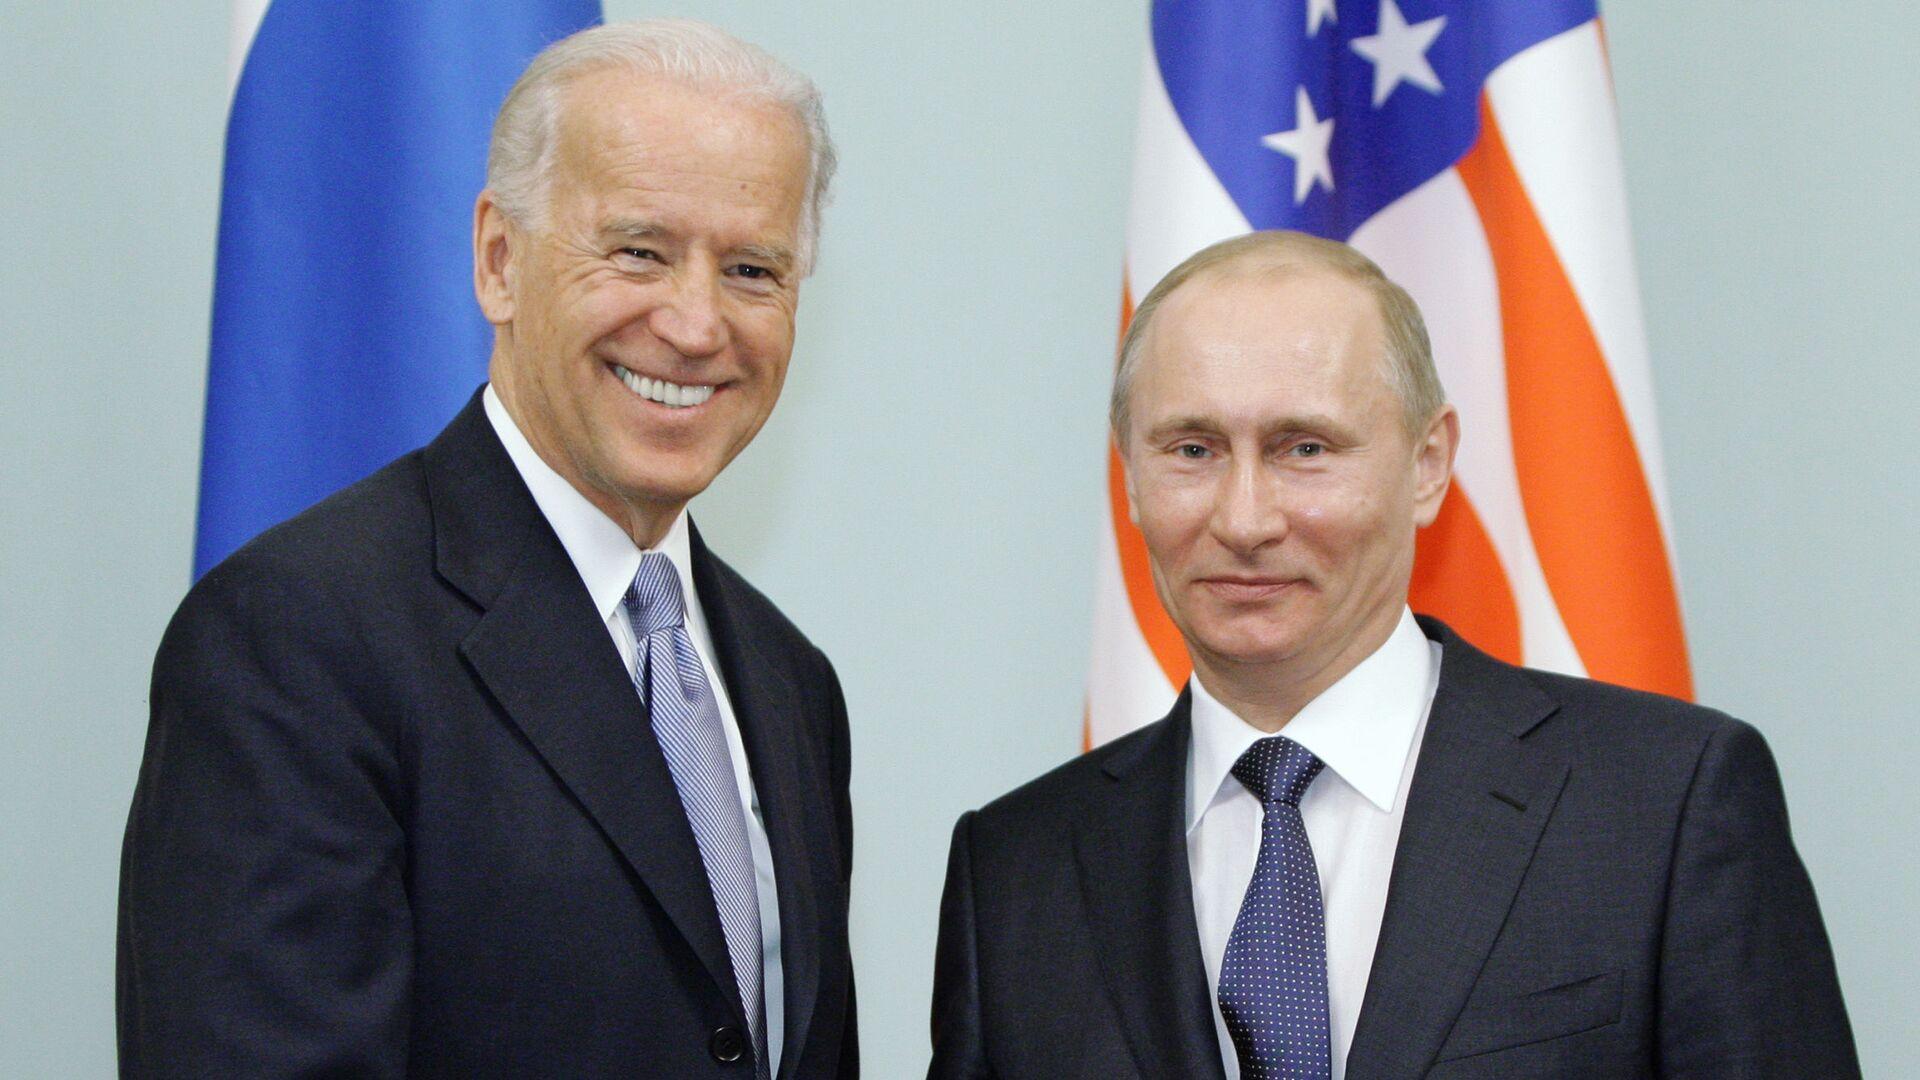 Vladimir Putin a Joe Biden v roce 2011 - Sputnik Česká republika, 1920, 06.06.2021